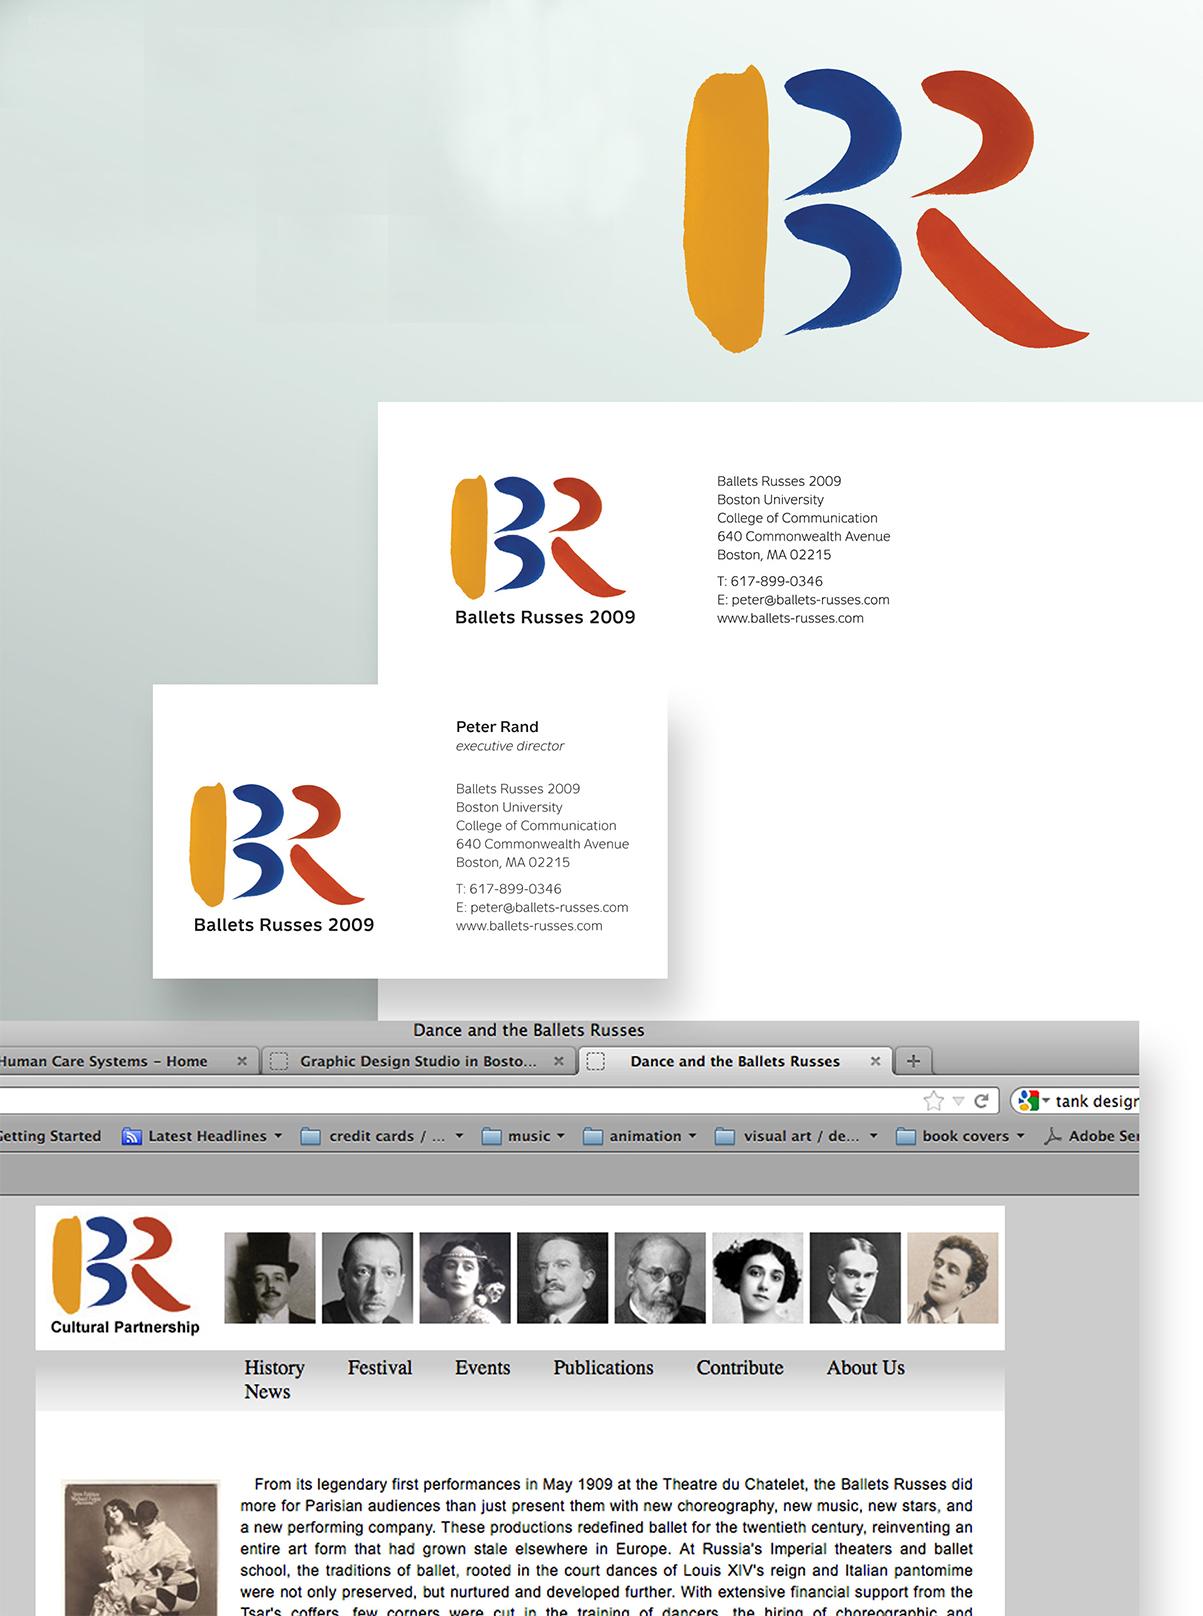 BR_1.jpg